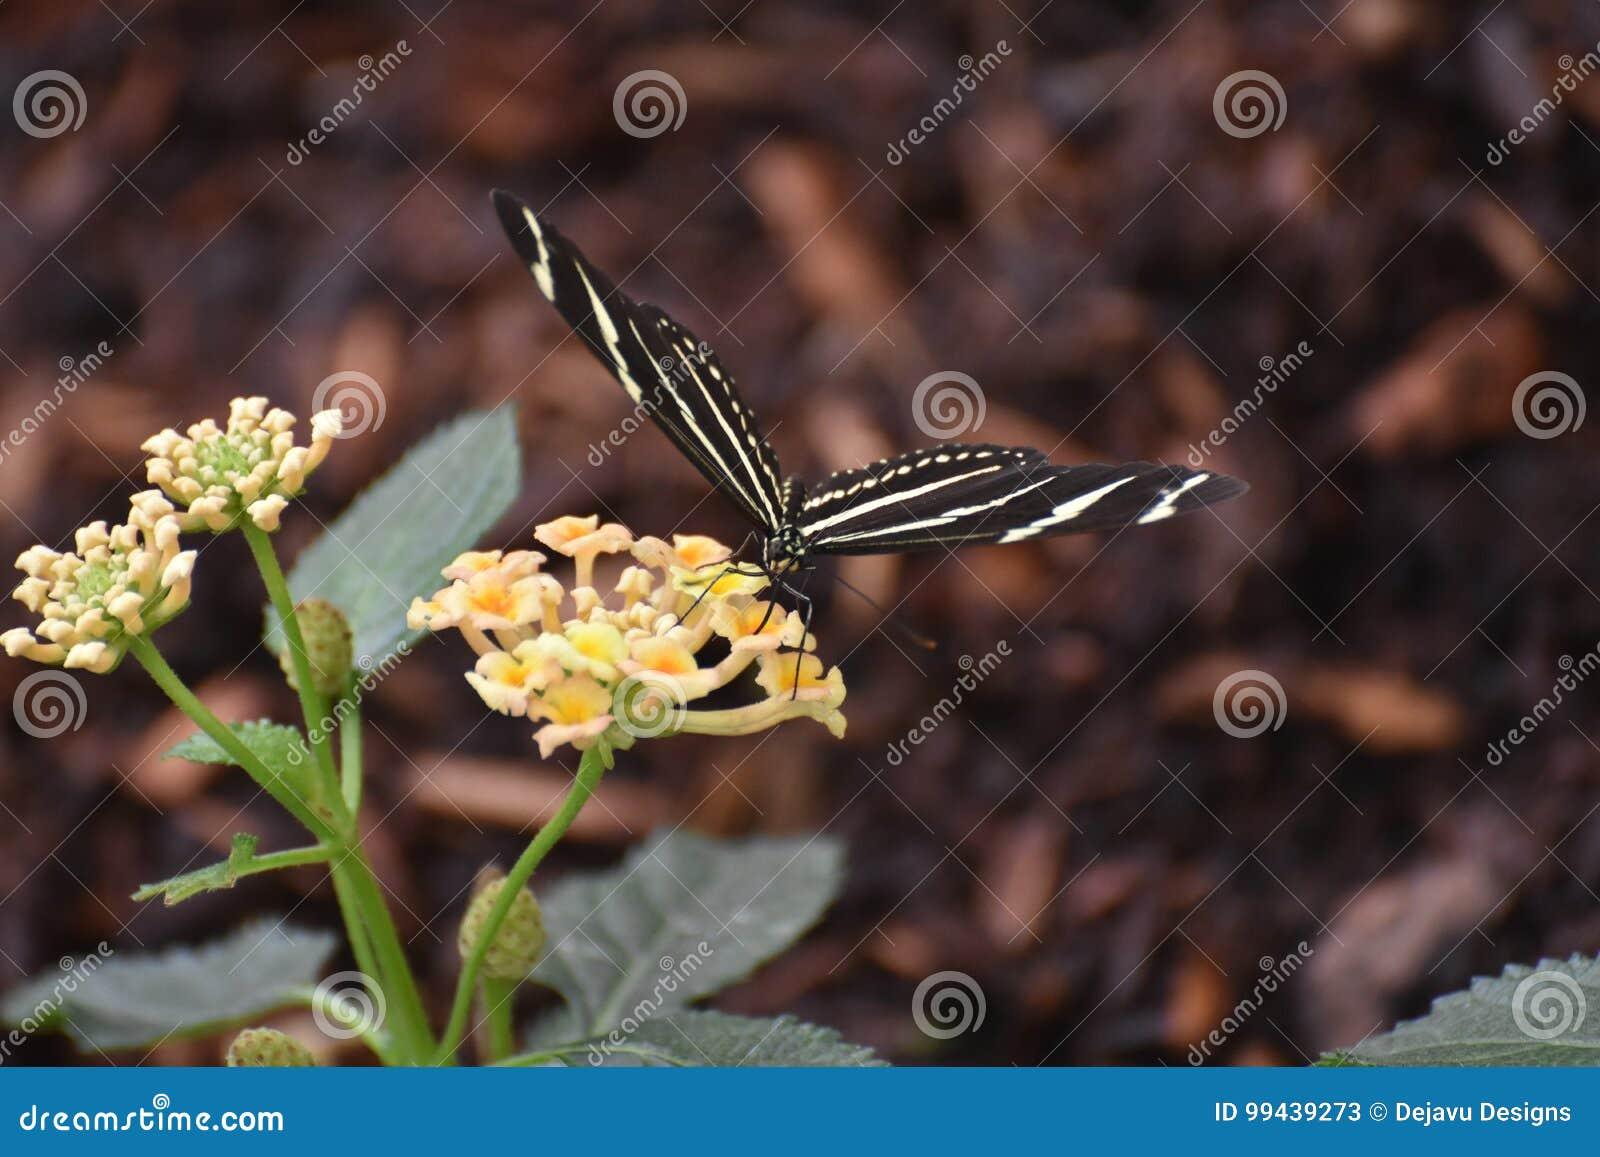 Pretty Black and White Zebra Butterfly on a Daisy